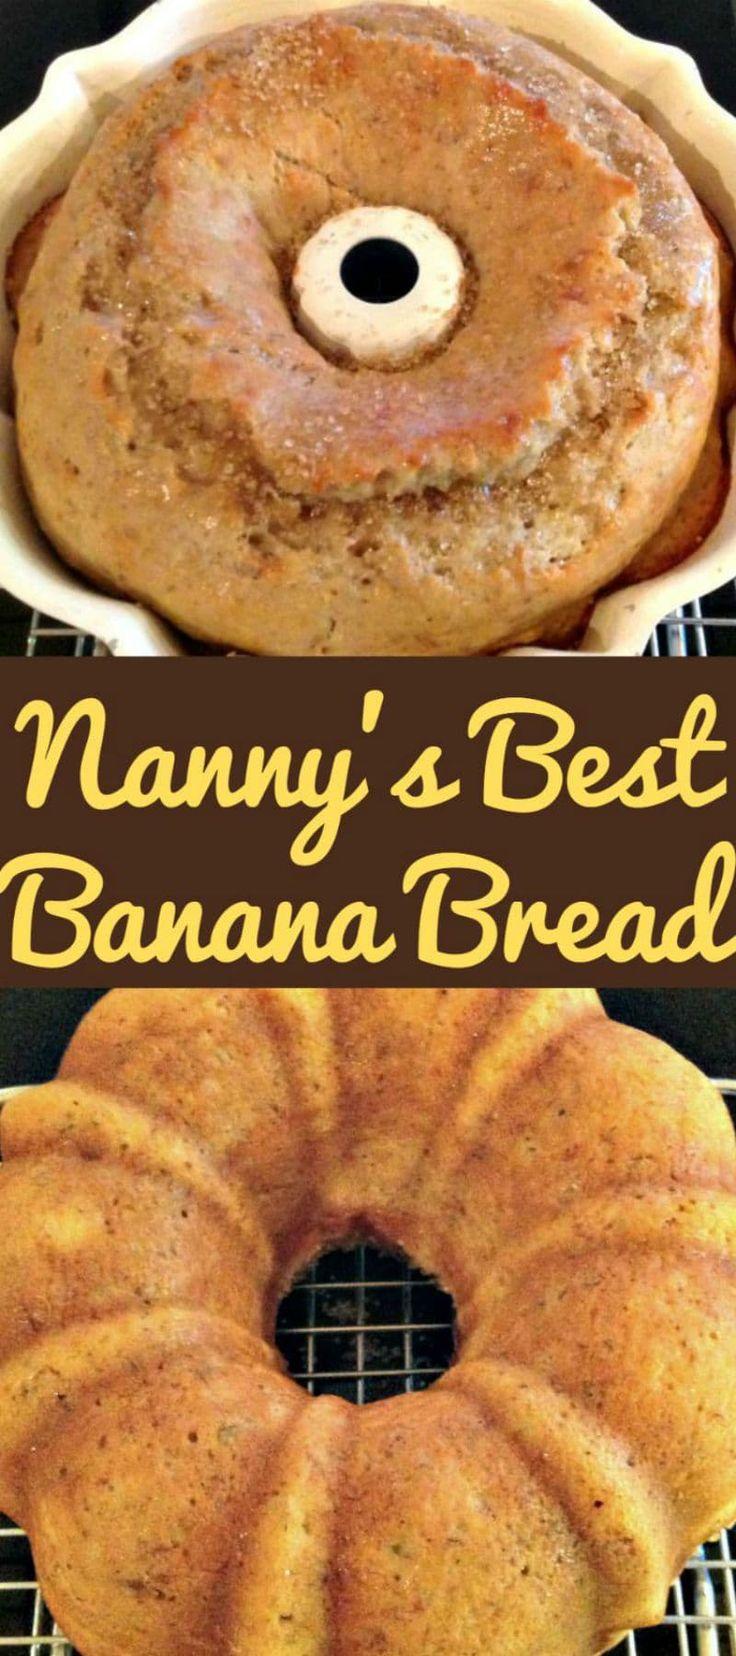 Oso Simple Squishy Banana : Las 25+ mejores ideas sobre Bonnie rotten en Pinterest Chistes, Memes en espanol y Imagenes de ...